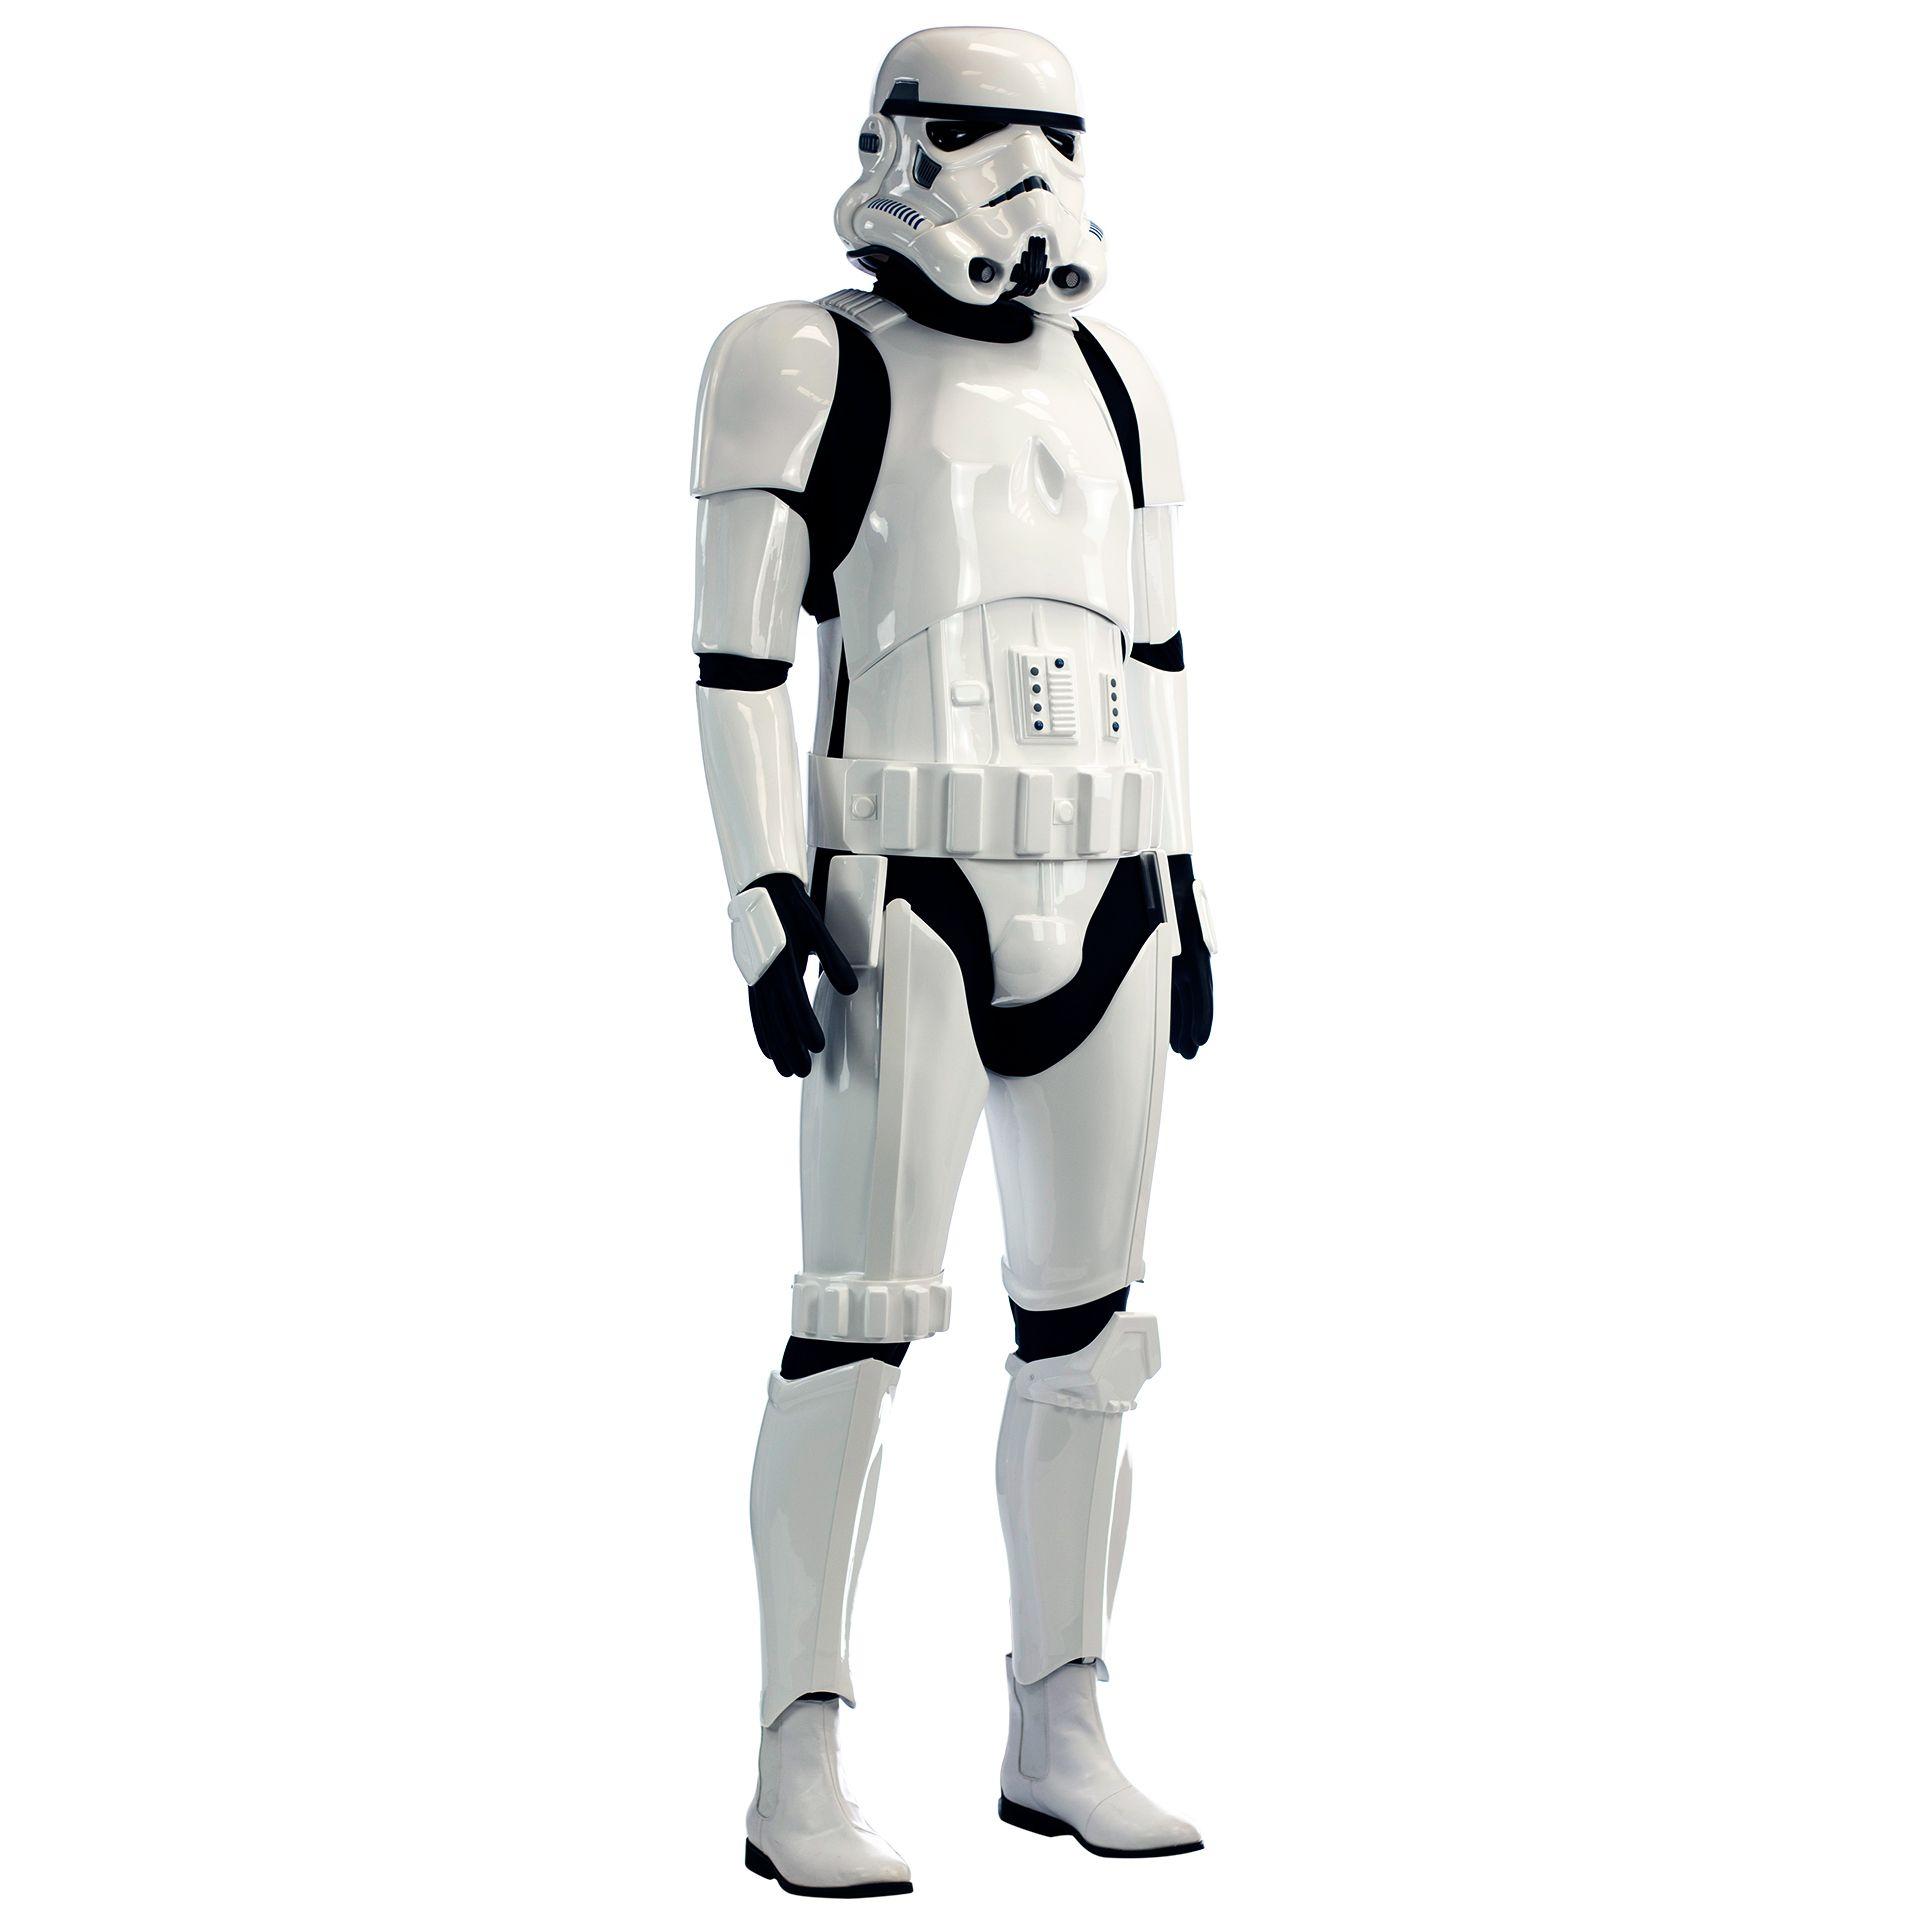 original-stormtrooper-armour-helmet-options-standard-helmet-neck-seal-[2]-504-p.jpg